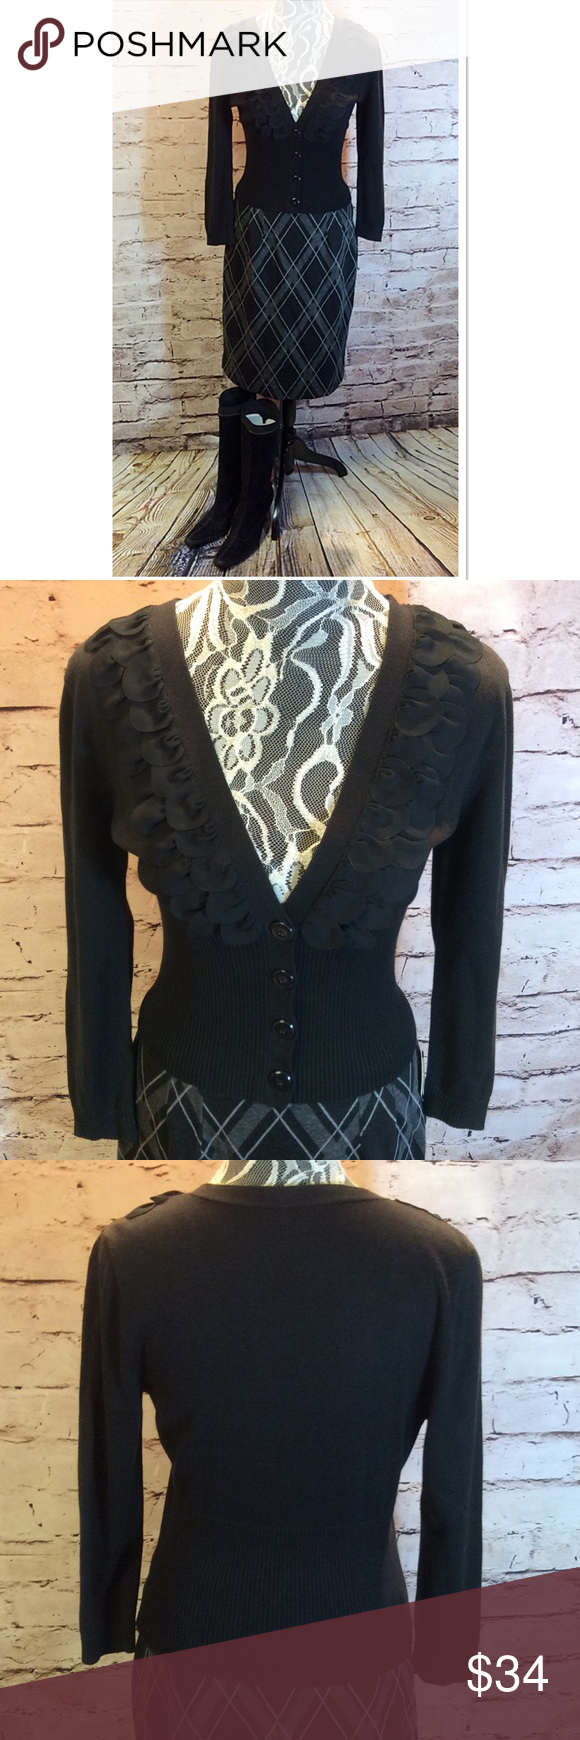 Nine west dressy black cardigan/sweater